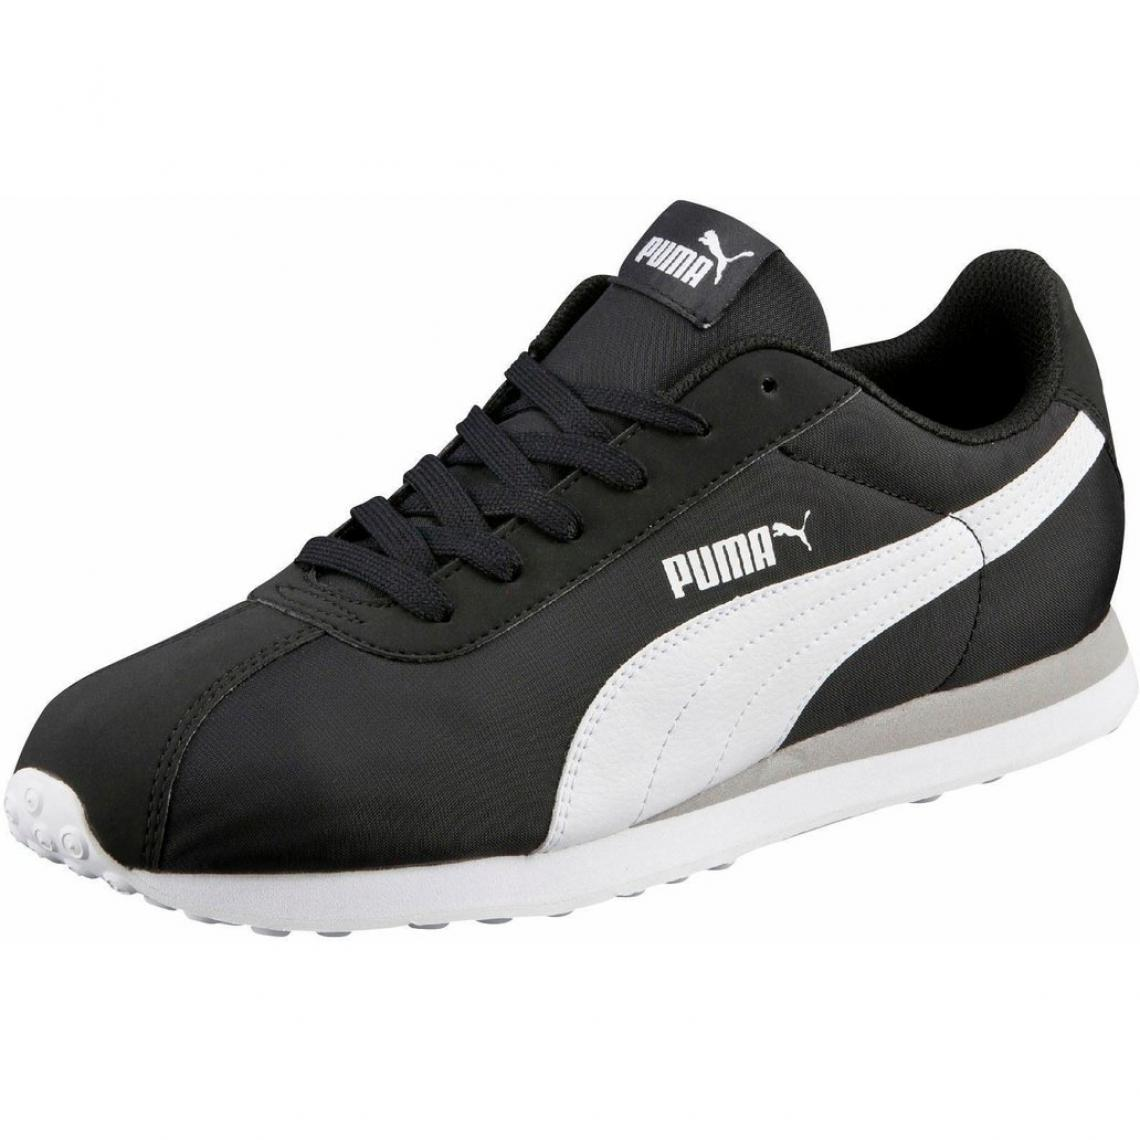 edfd2f15d320 Puma Turin NL chaussures de sport basses homme - Noir - Blanc | 3 ...